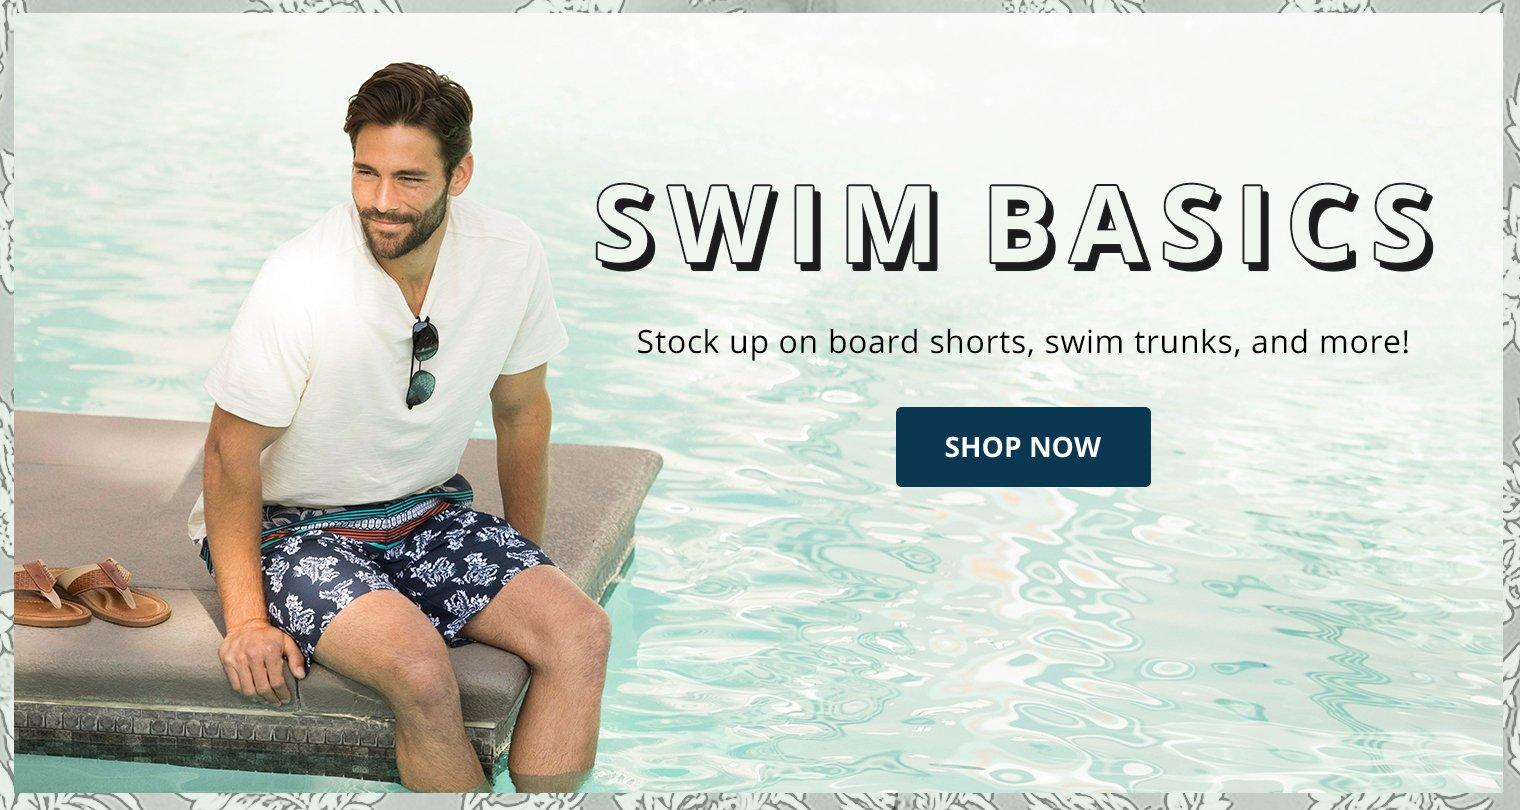 Swim basics. Stock up on board shorts, swim trunks, and more!